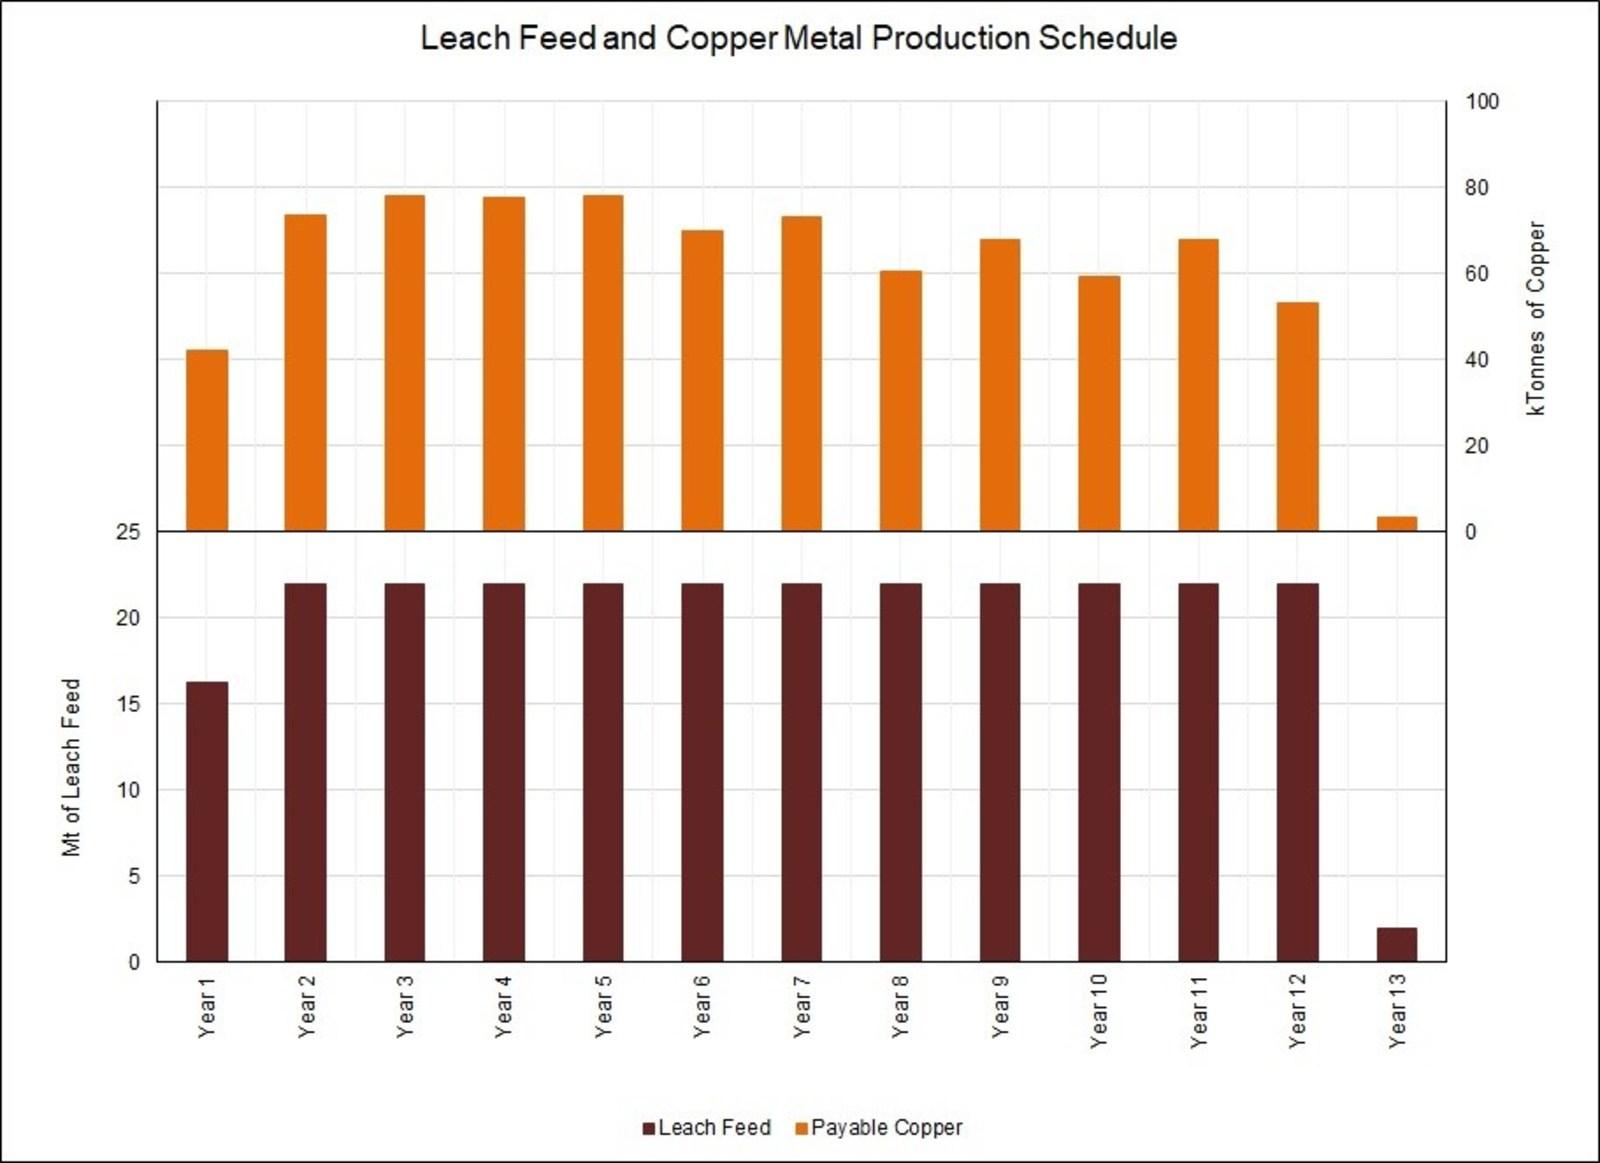 Image 2 - Cu Production Schedule